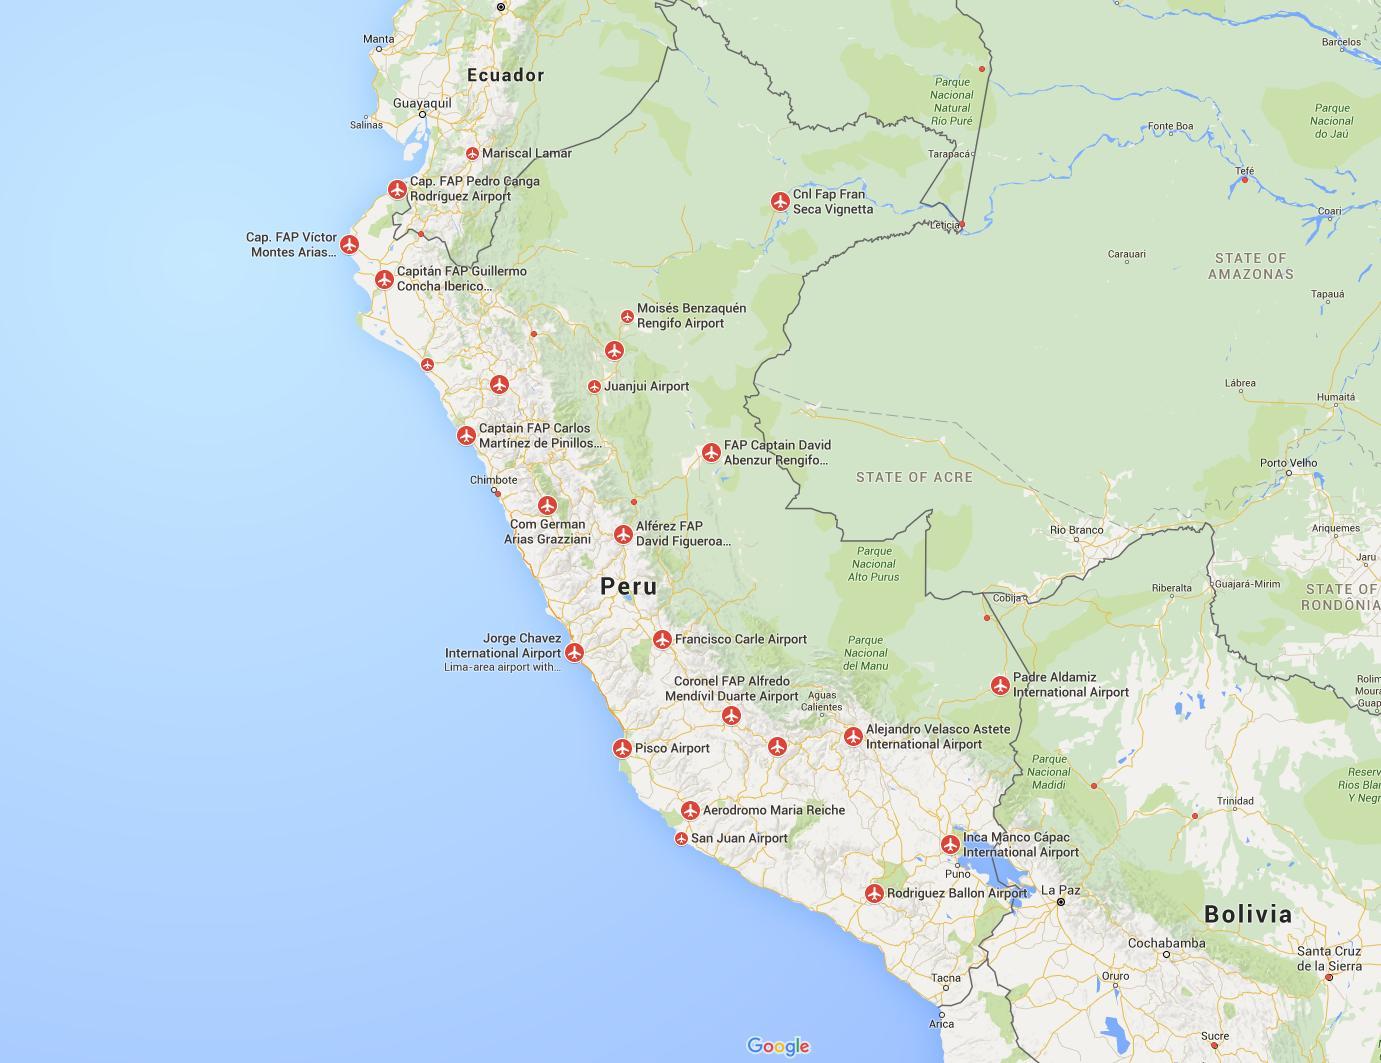 Carte Amerique Du Sud Aeroport.Perou Aeroports Carte Des Aeroports Au Perou A La Carte